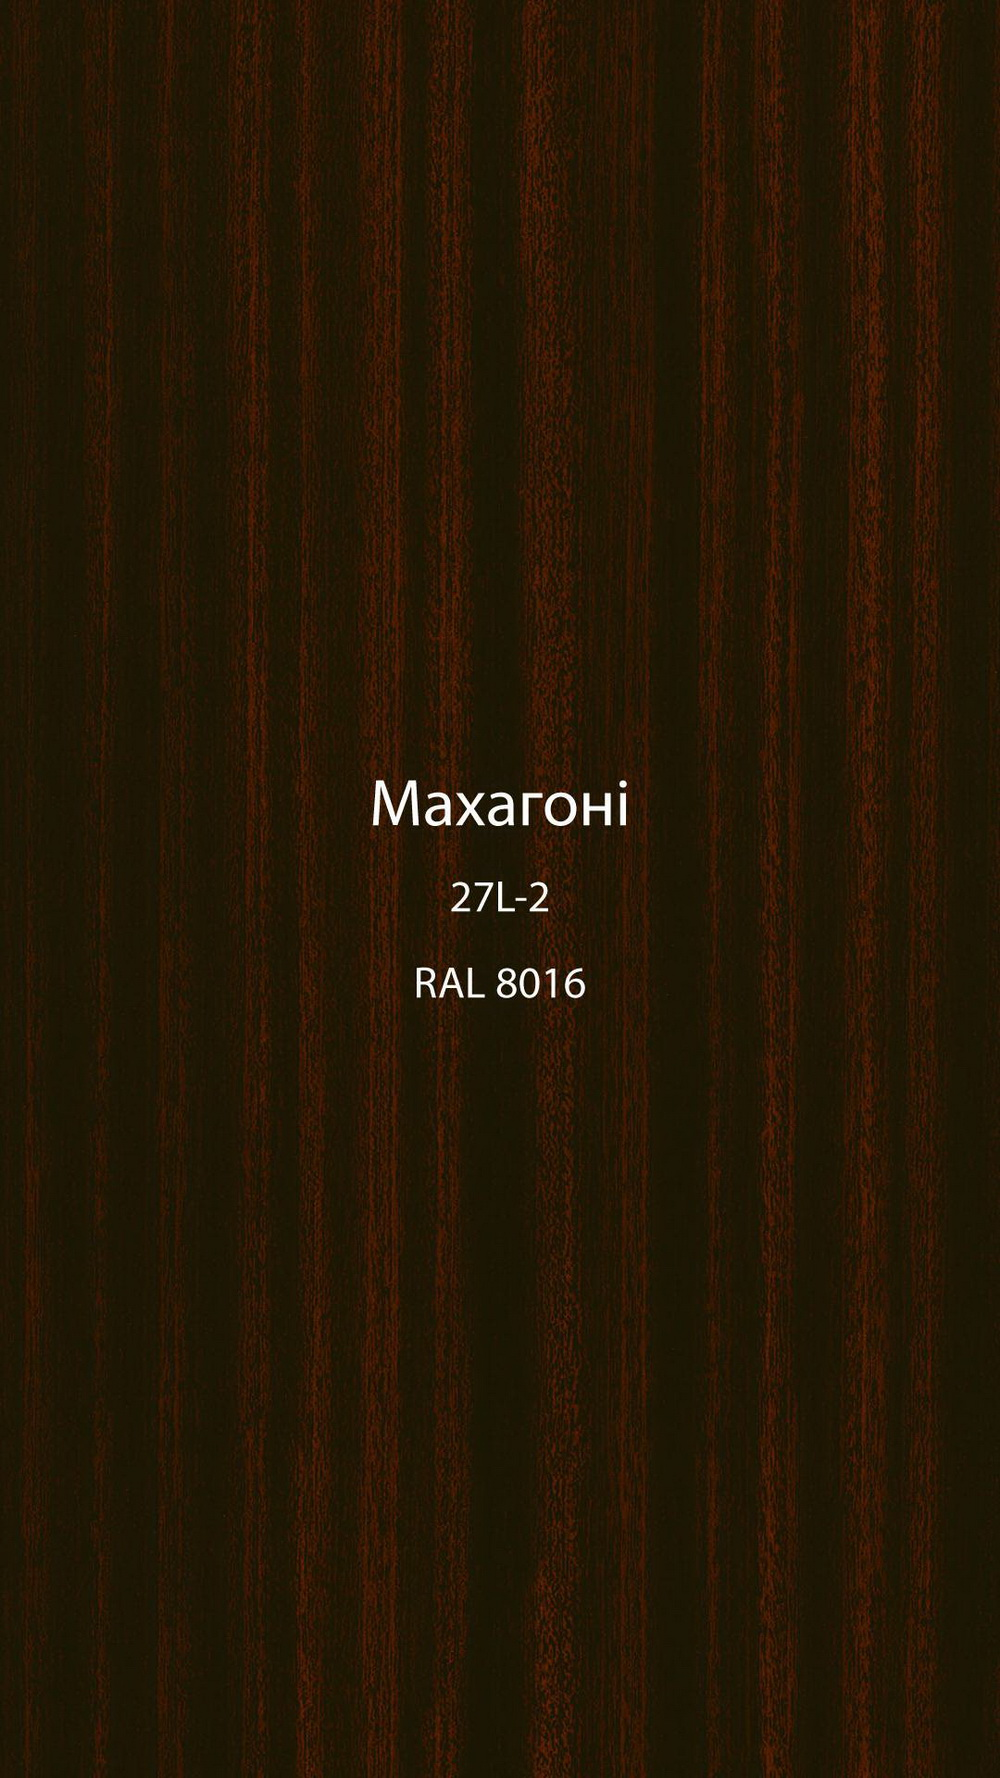 Махагоні - колір ламінації профілів заводу EKIPAZH